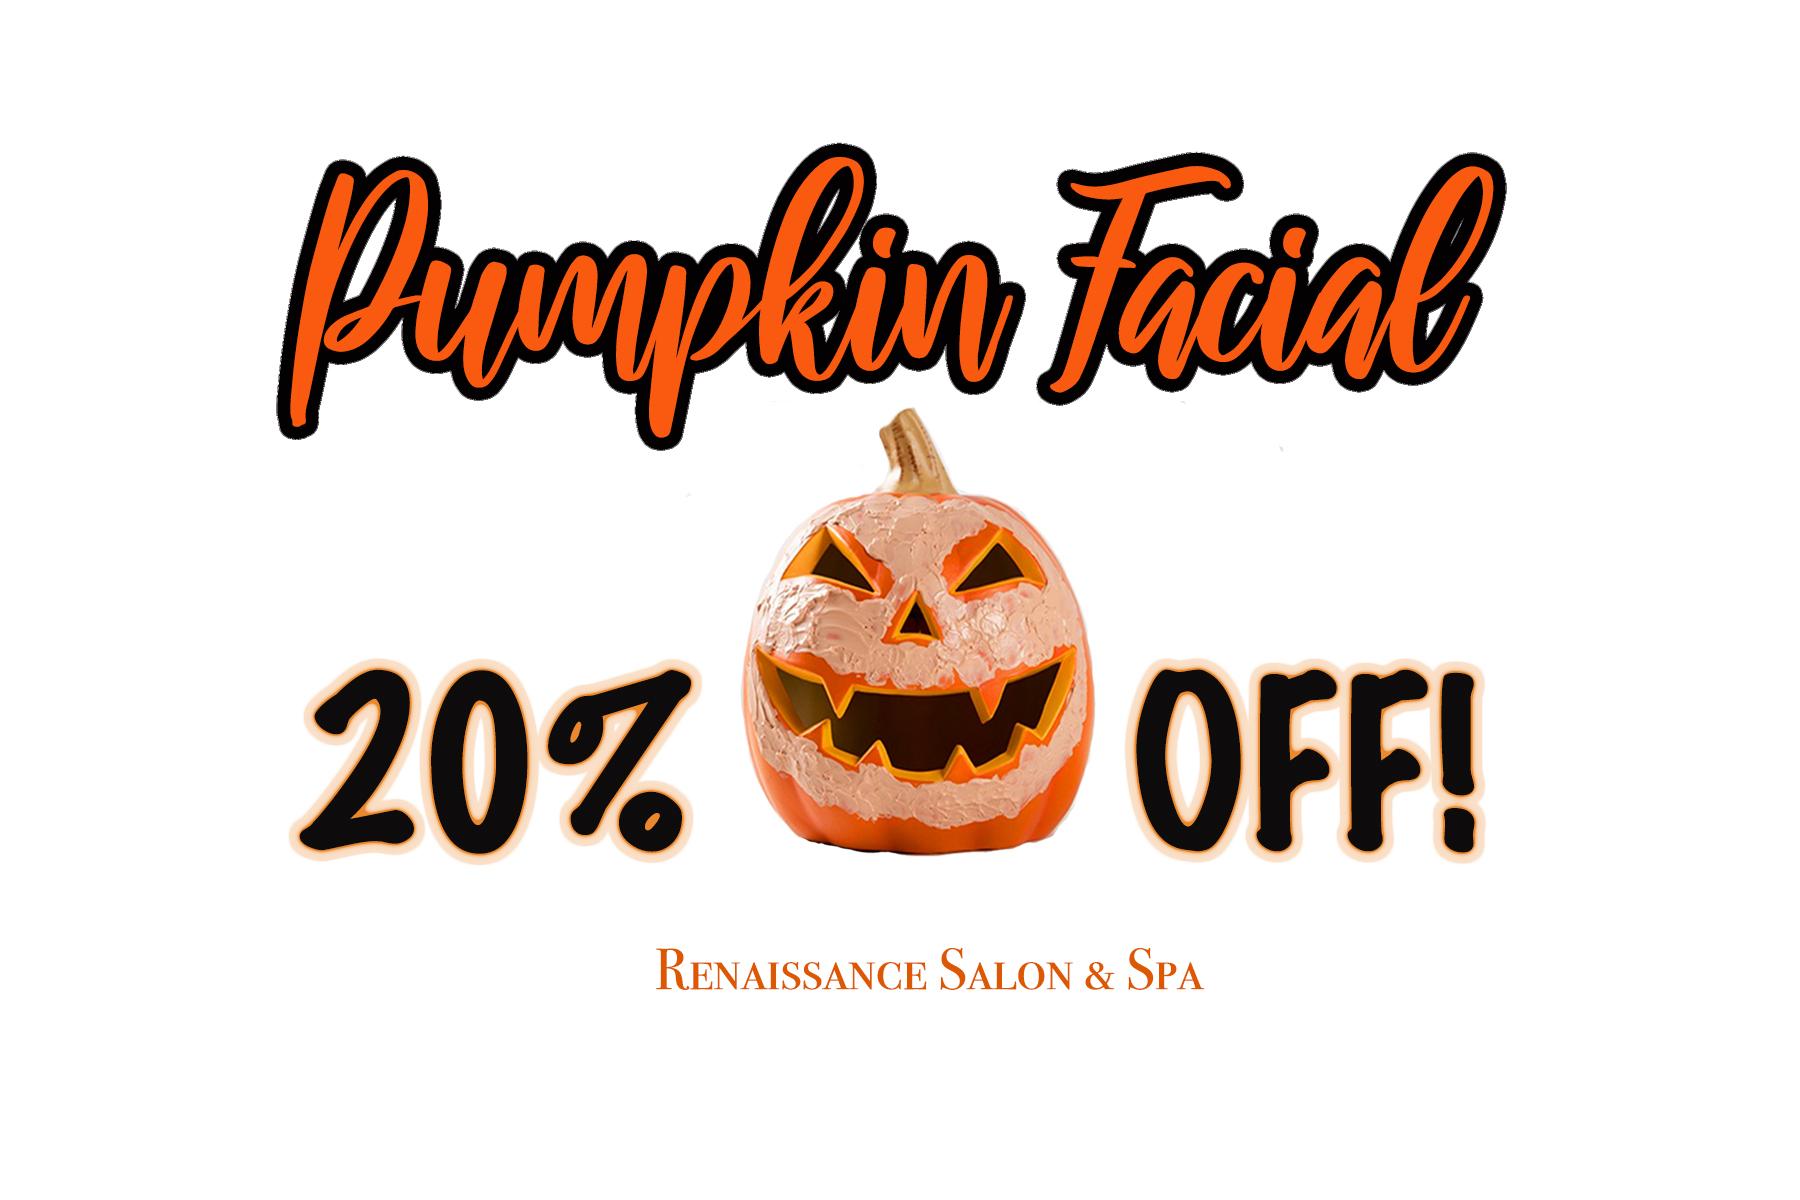 pumpkinfacial.jpg